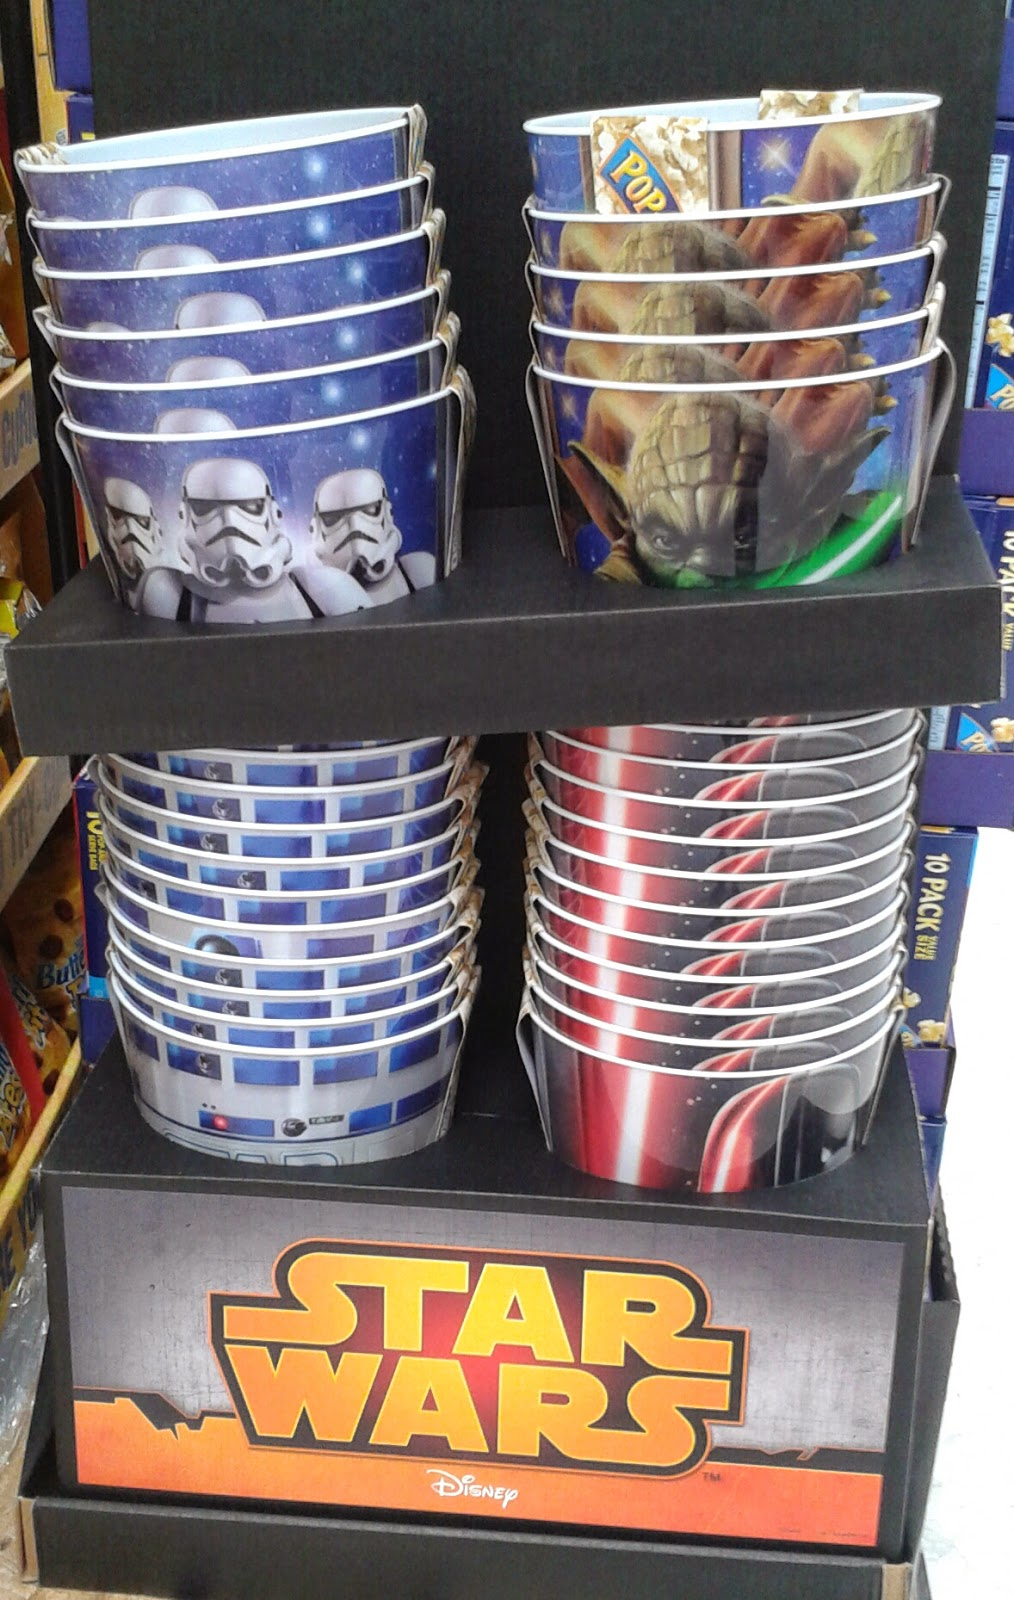 Disney at heart unexpected star wars merchandise for Merchandising star wars